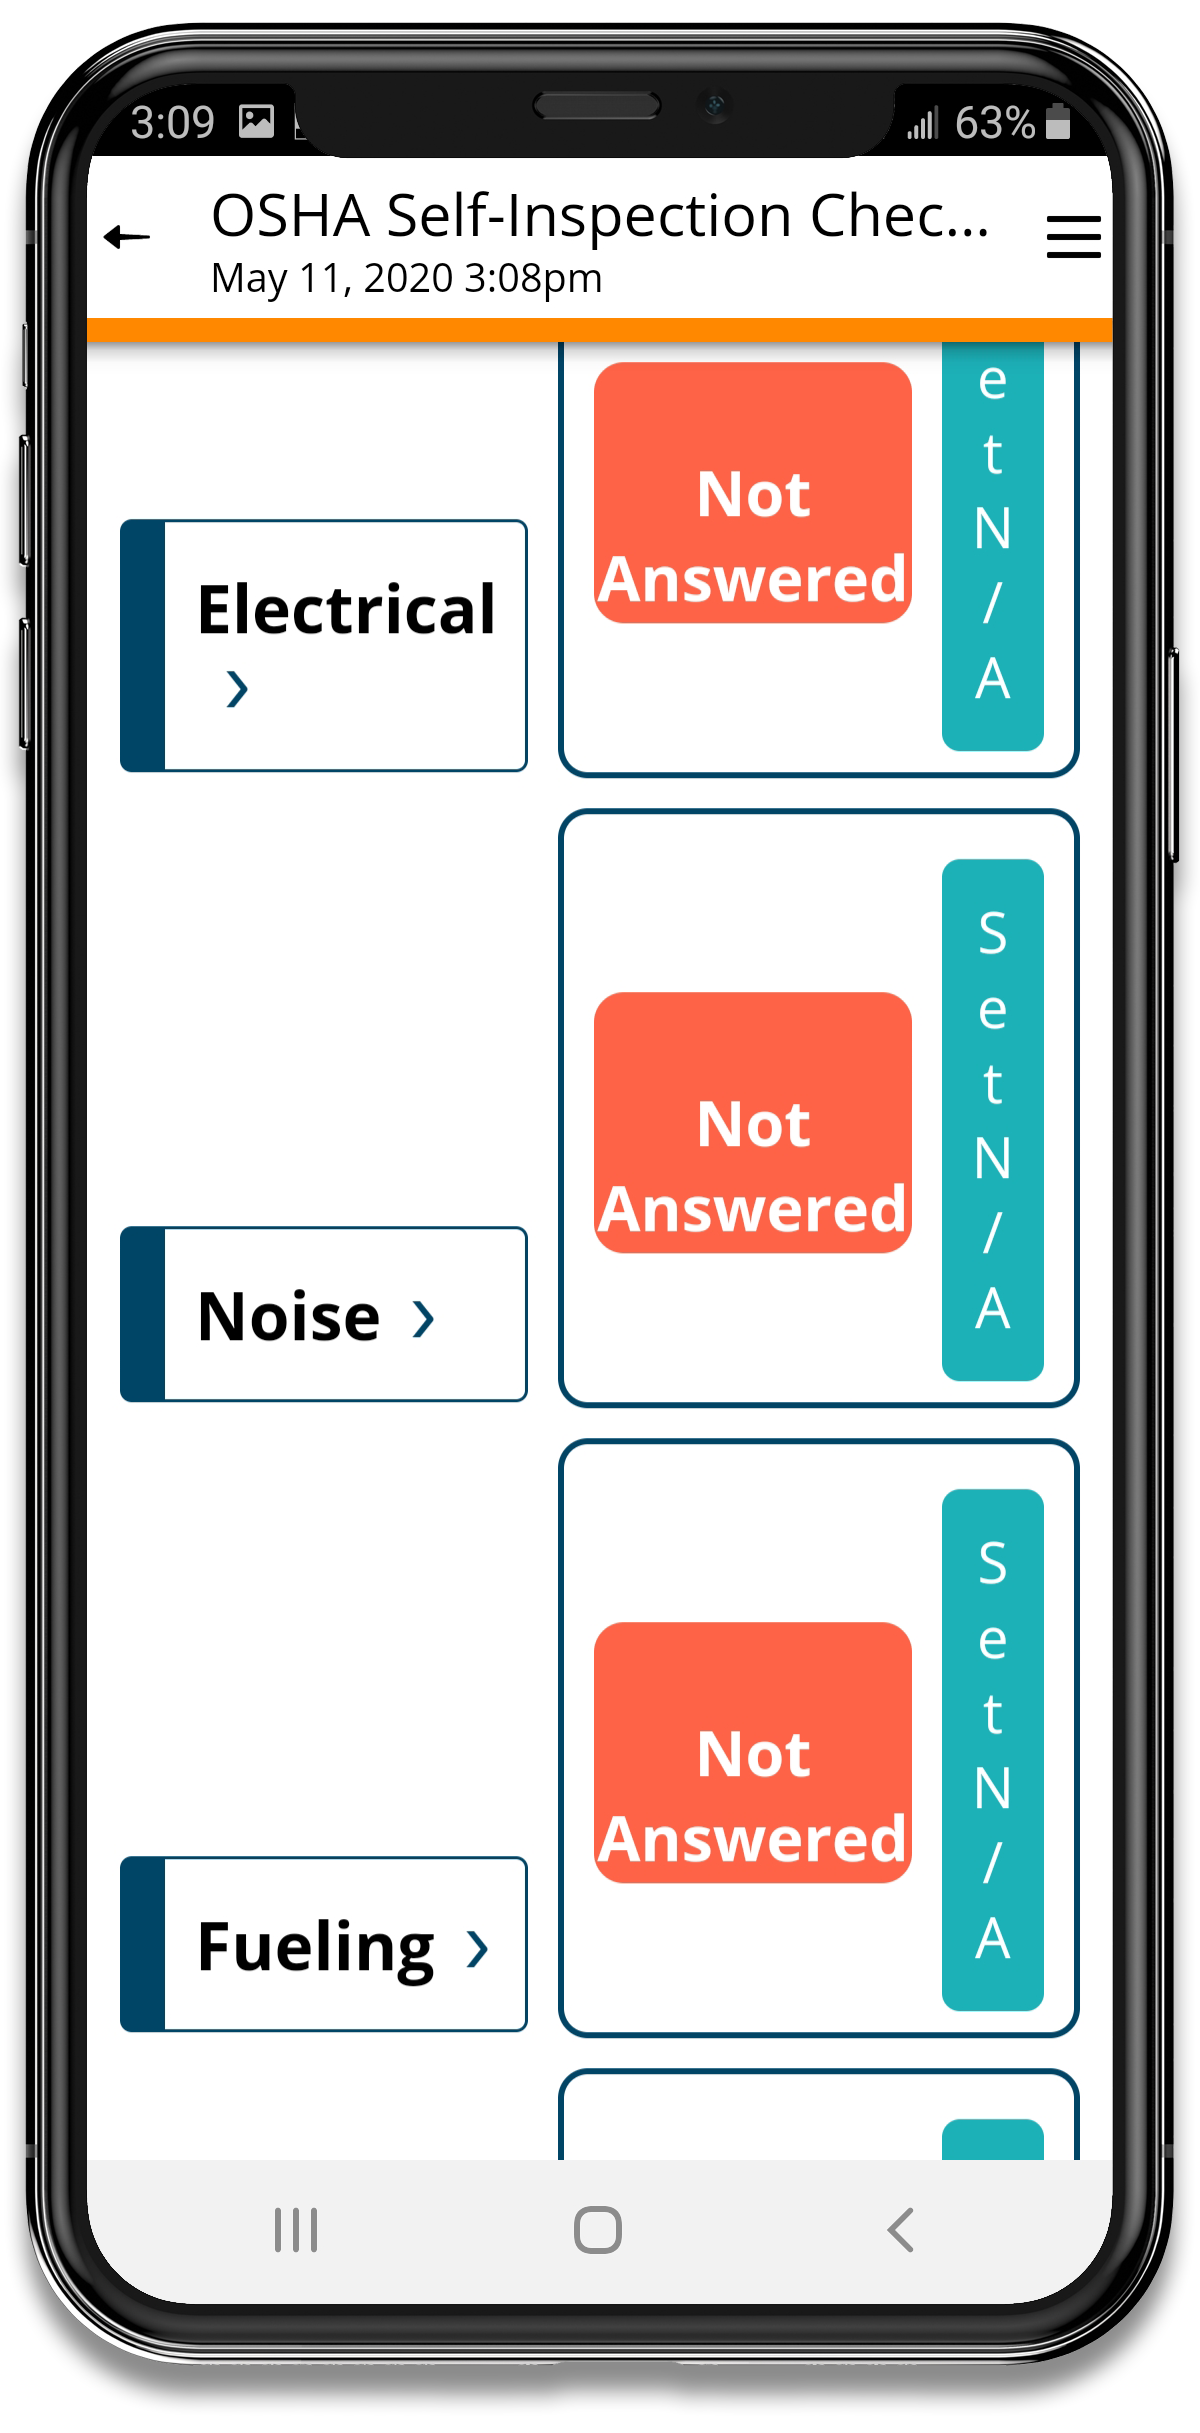 OSHA Self Inspection Checklist App